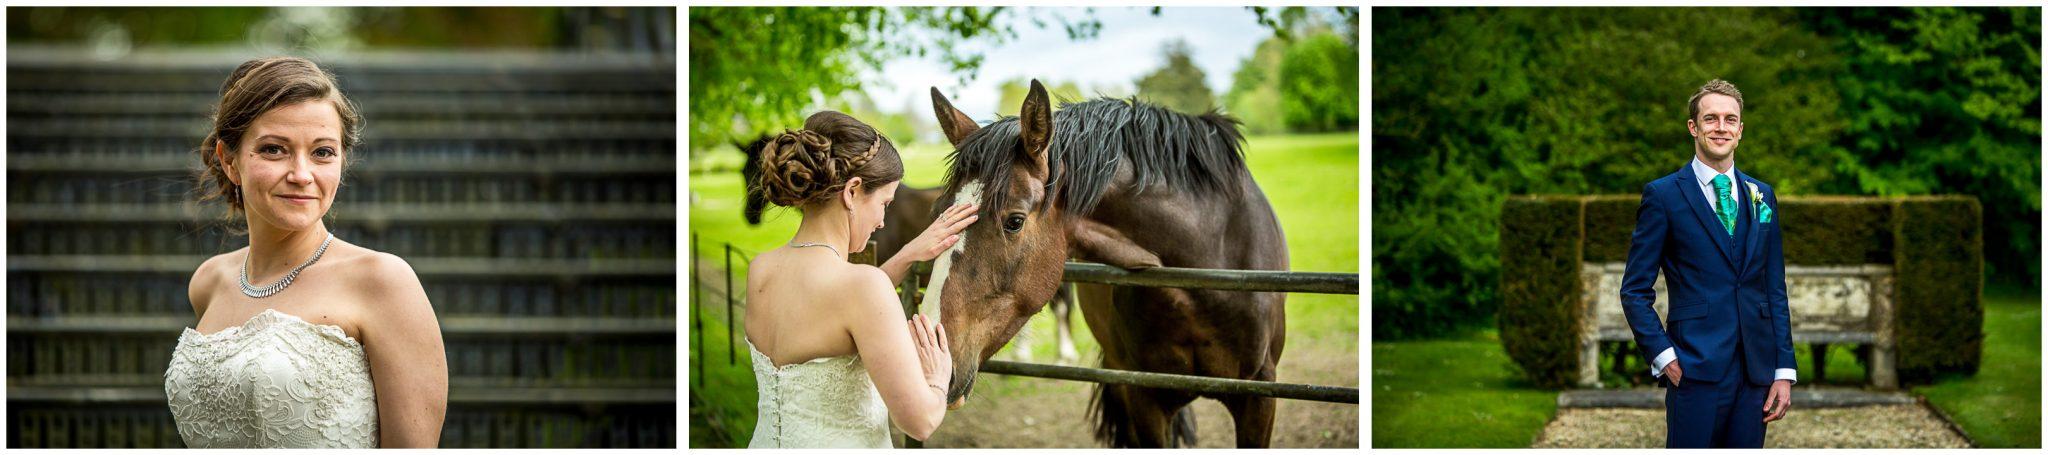 Avington Park wedding photography bride and groom portraits